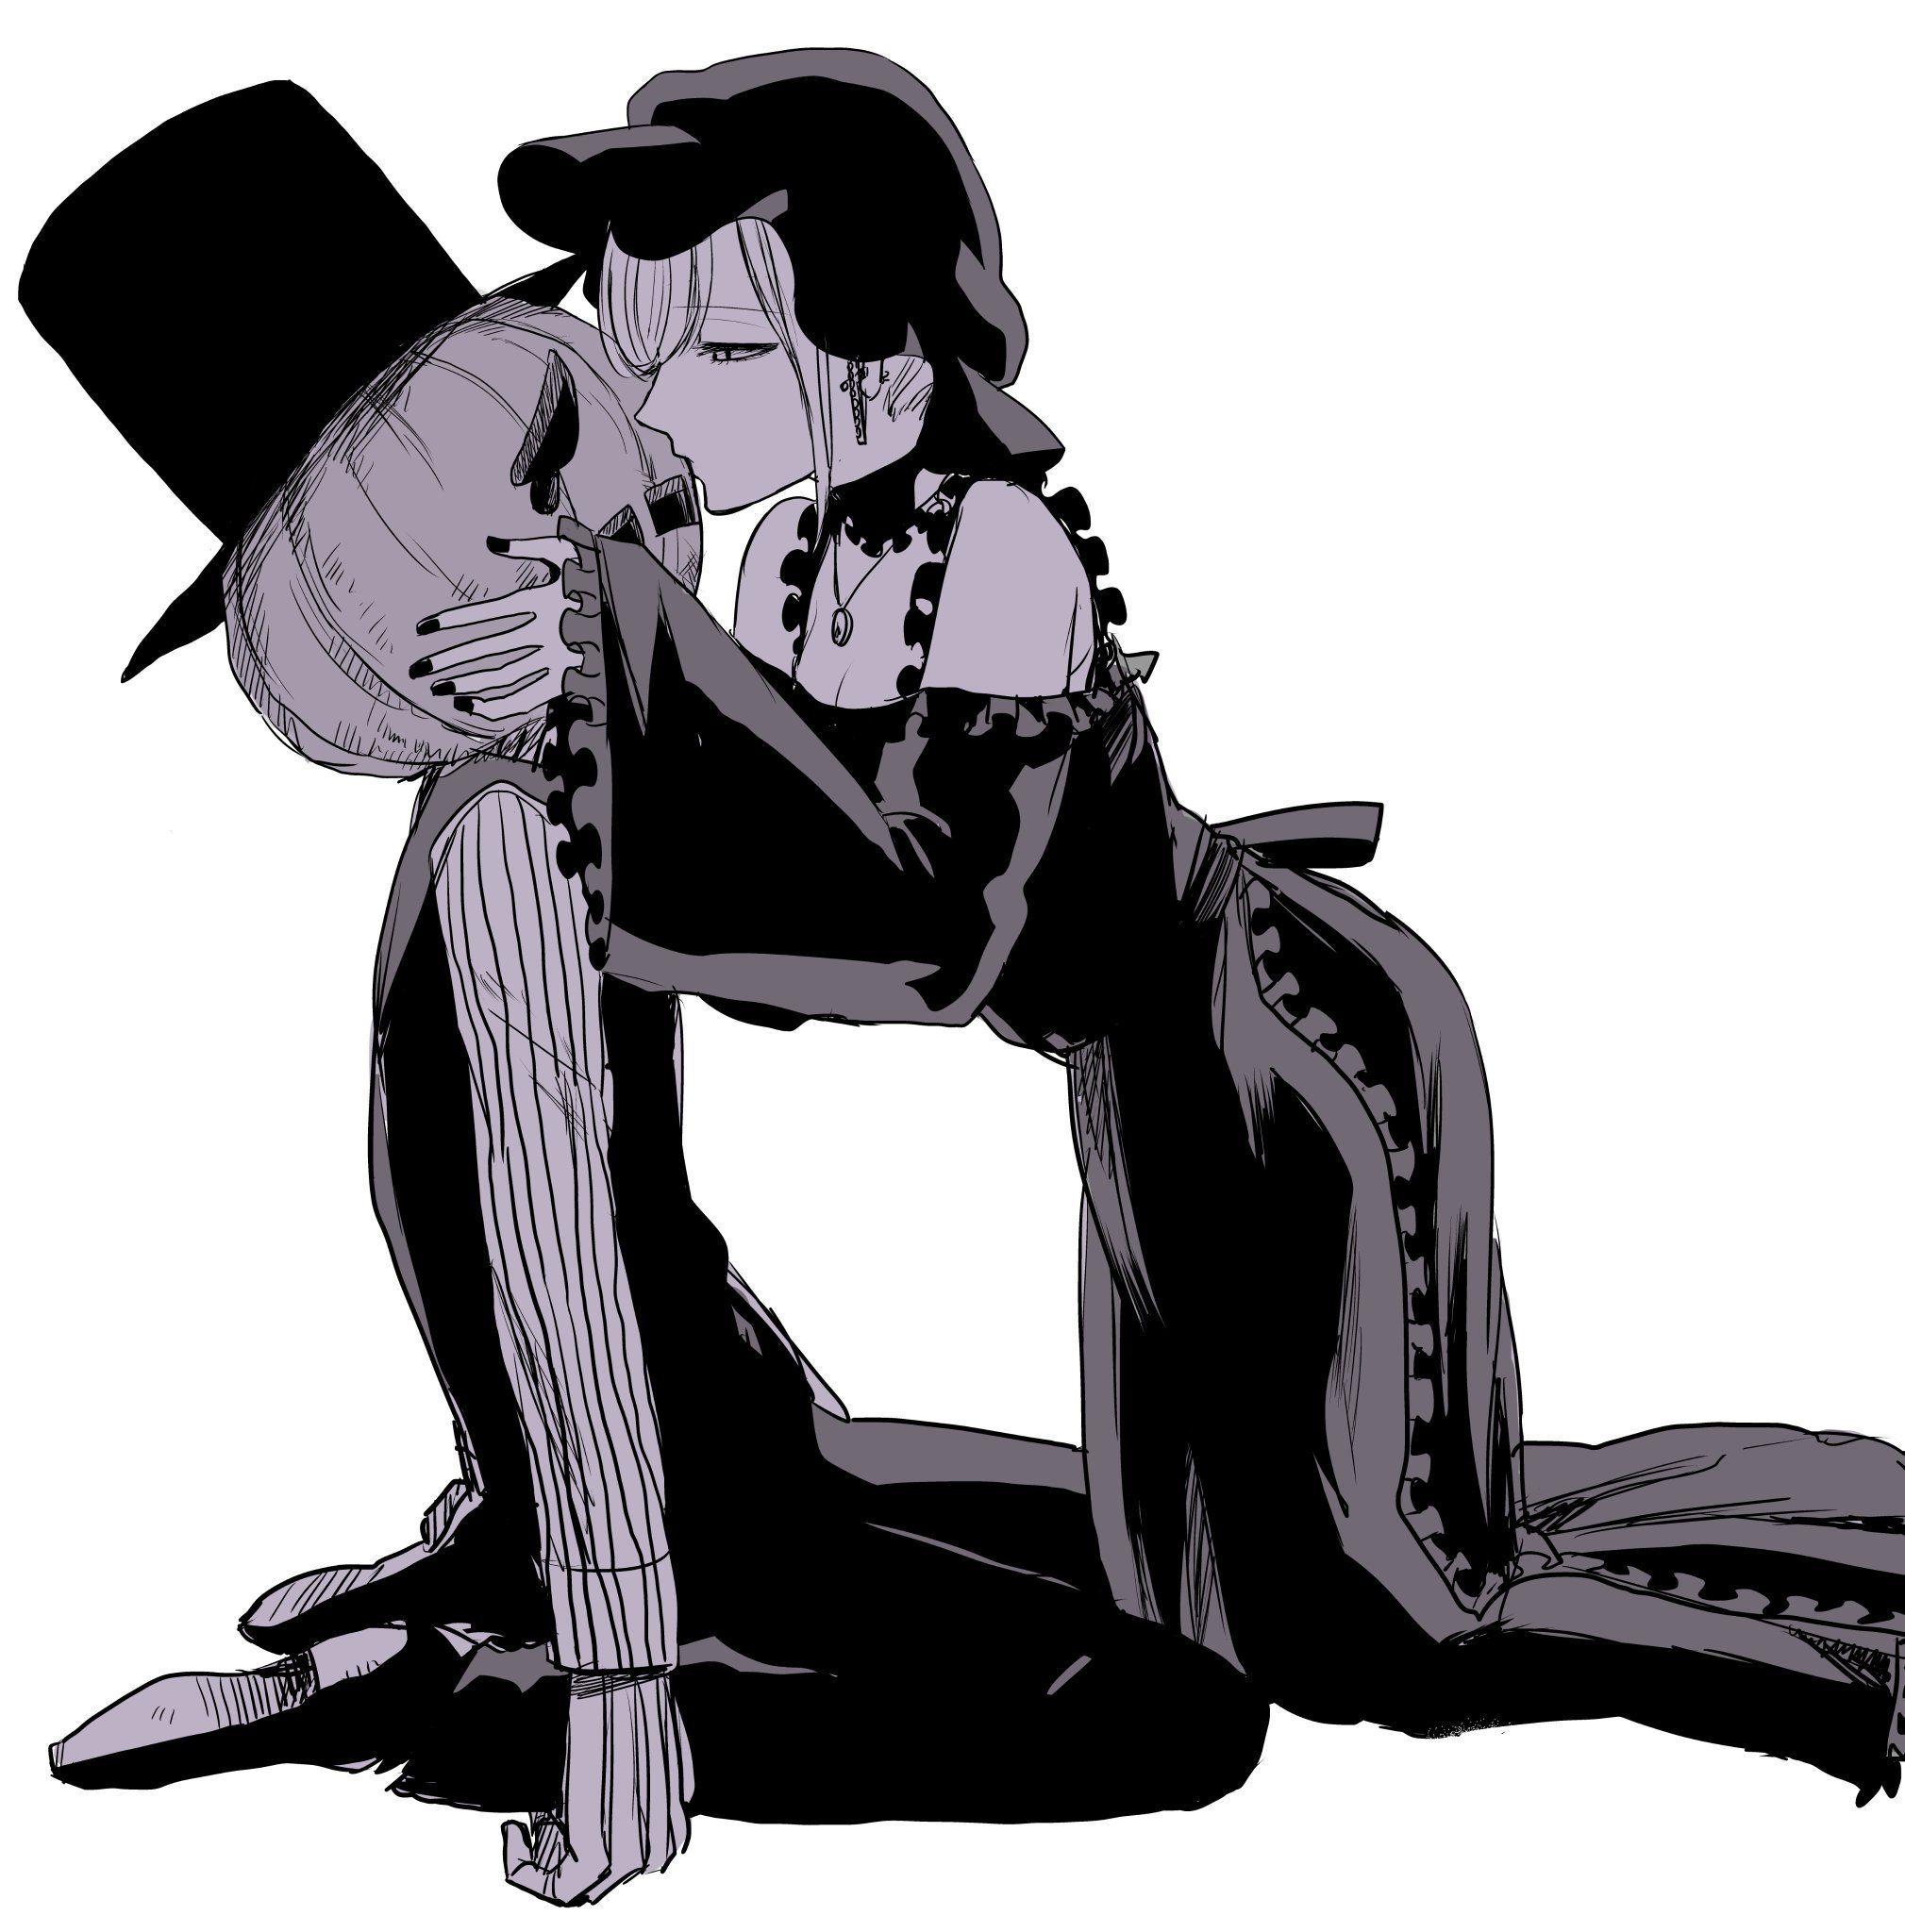 The Duke of Death and his Black Maid Chap 18 - Truyện tranh | Truyện tranh  online | Đọc truyện tranh | Manga